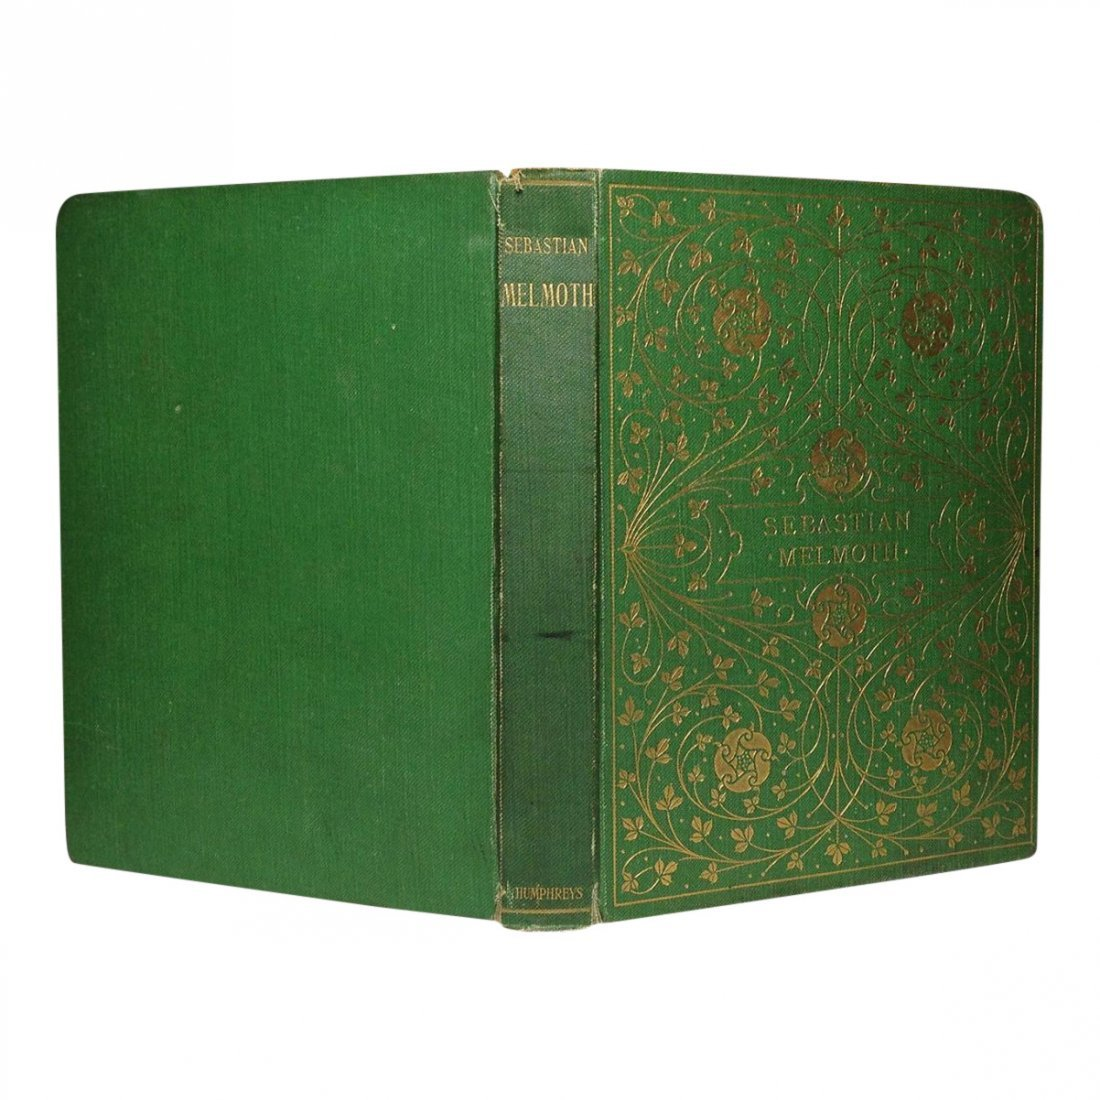 Sebastian Melmoth & The Soul of A Man by Oscar Wilde